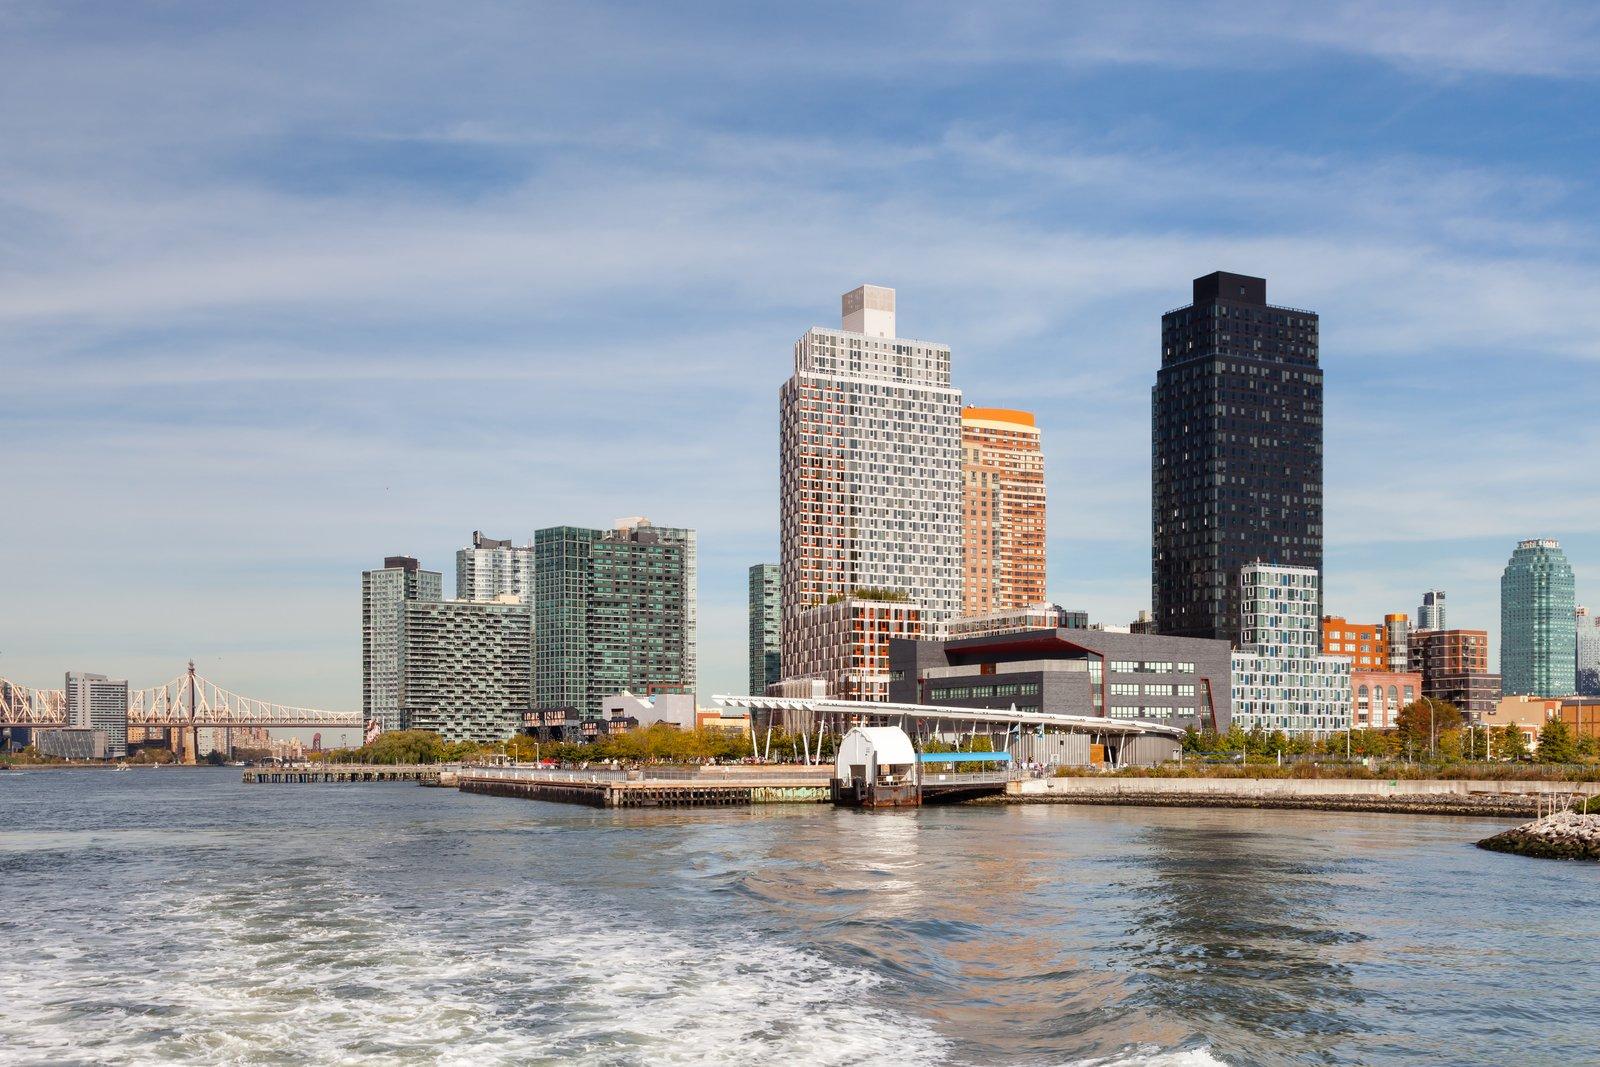 Lake Success Long Island, NY Private Investigator